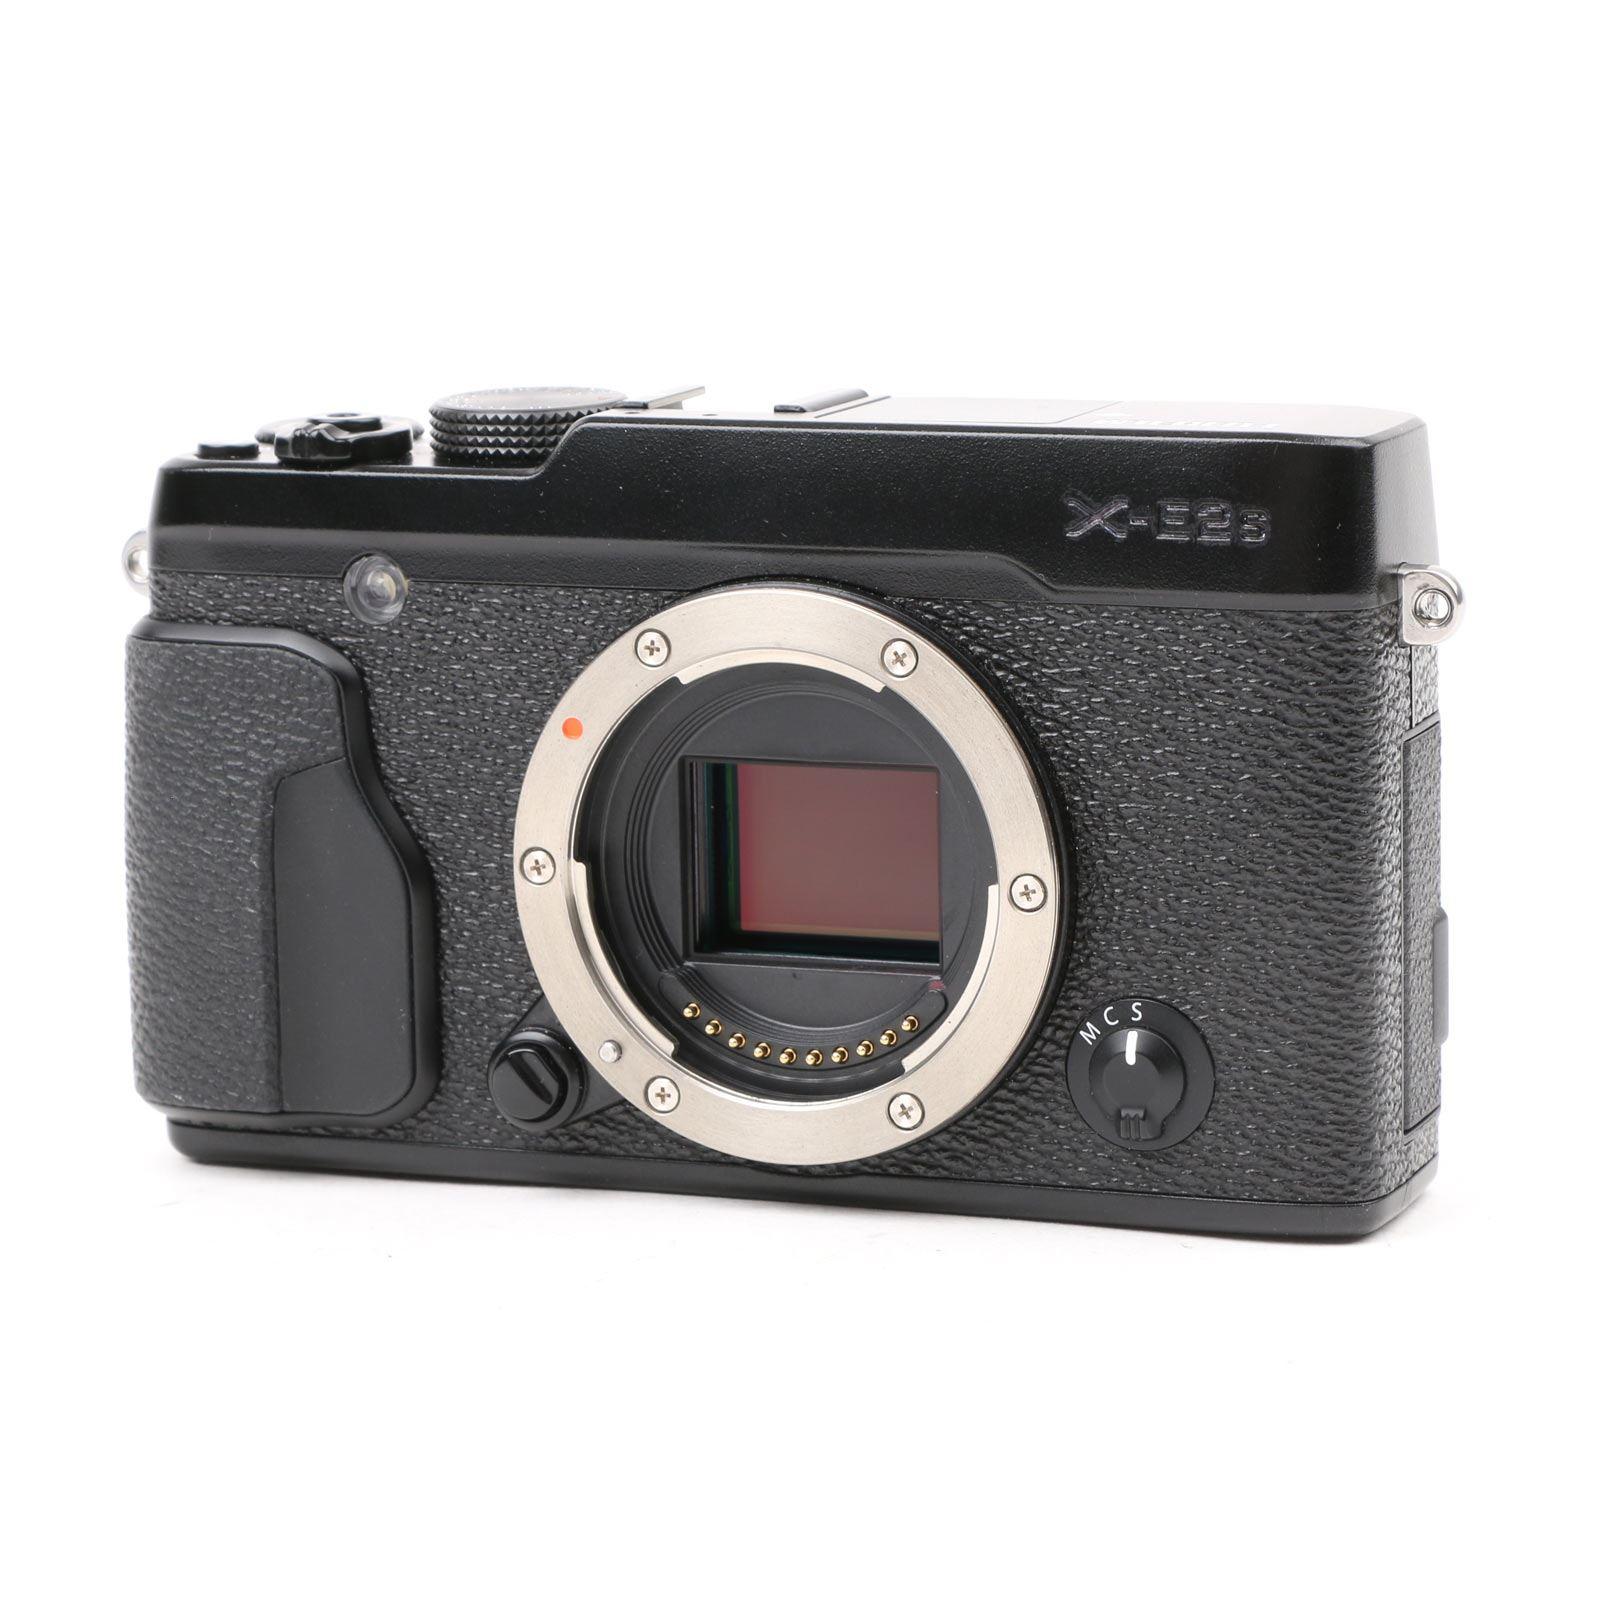 Image of Used Fujifilm X-E2S Digital Camera Body - Black